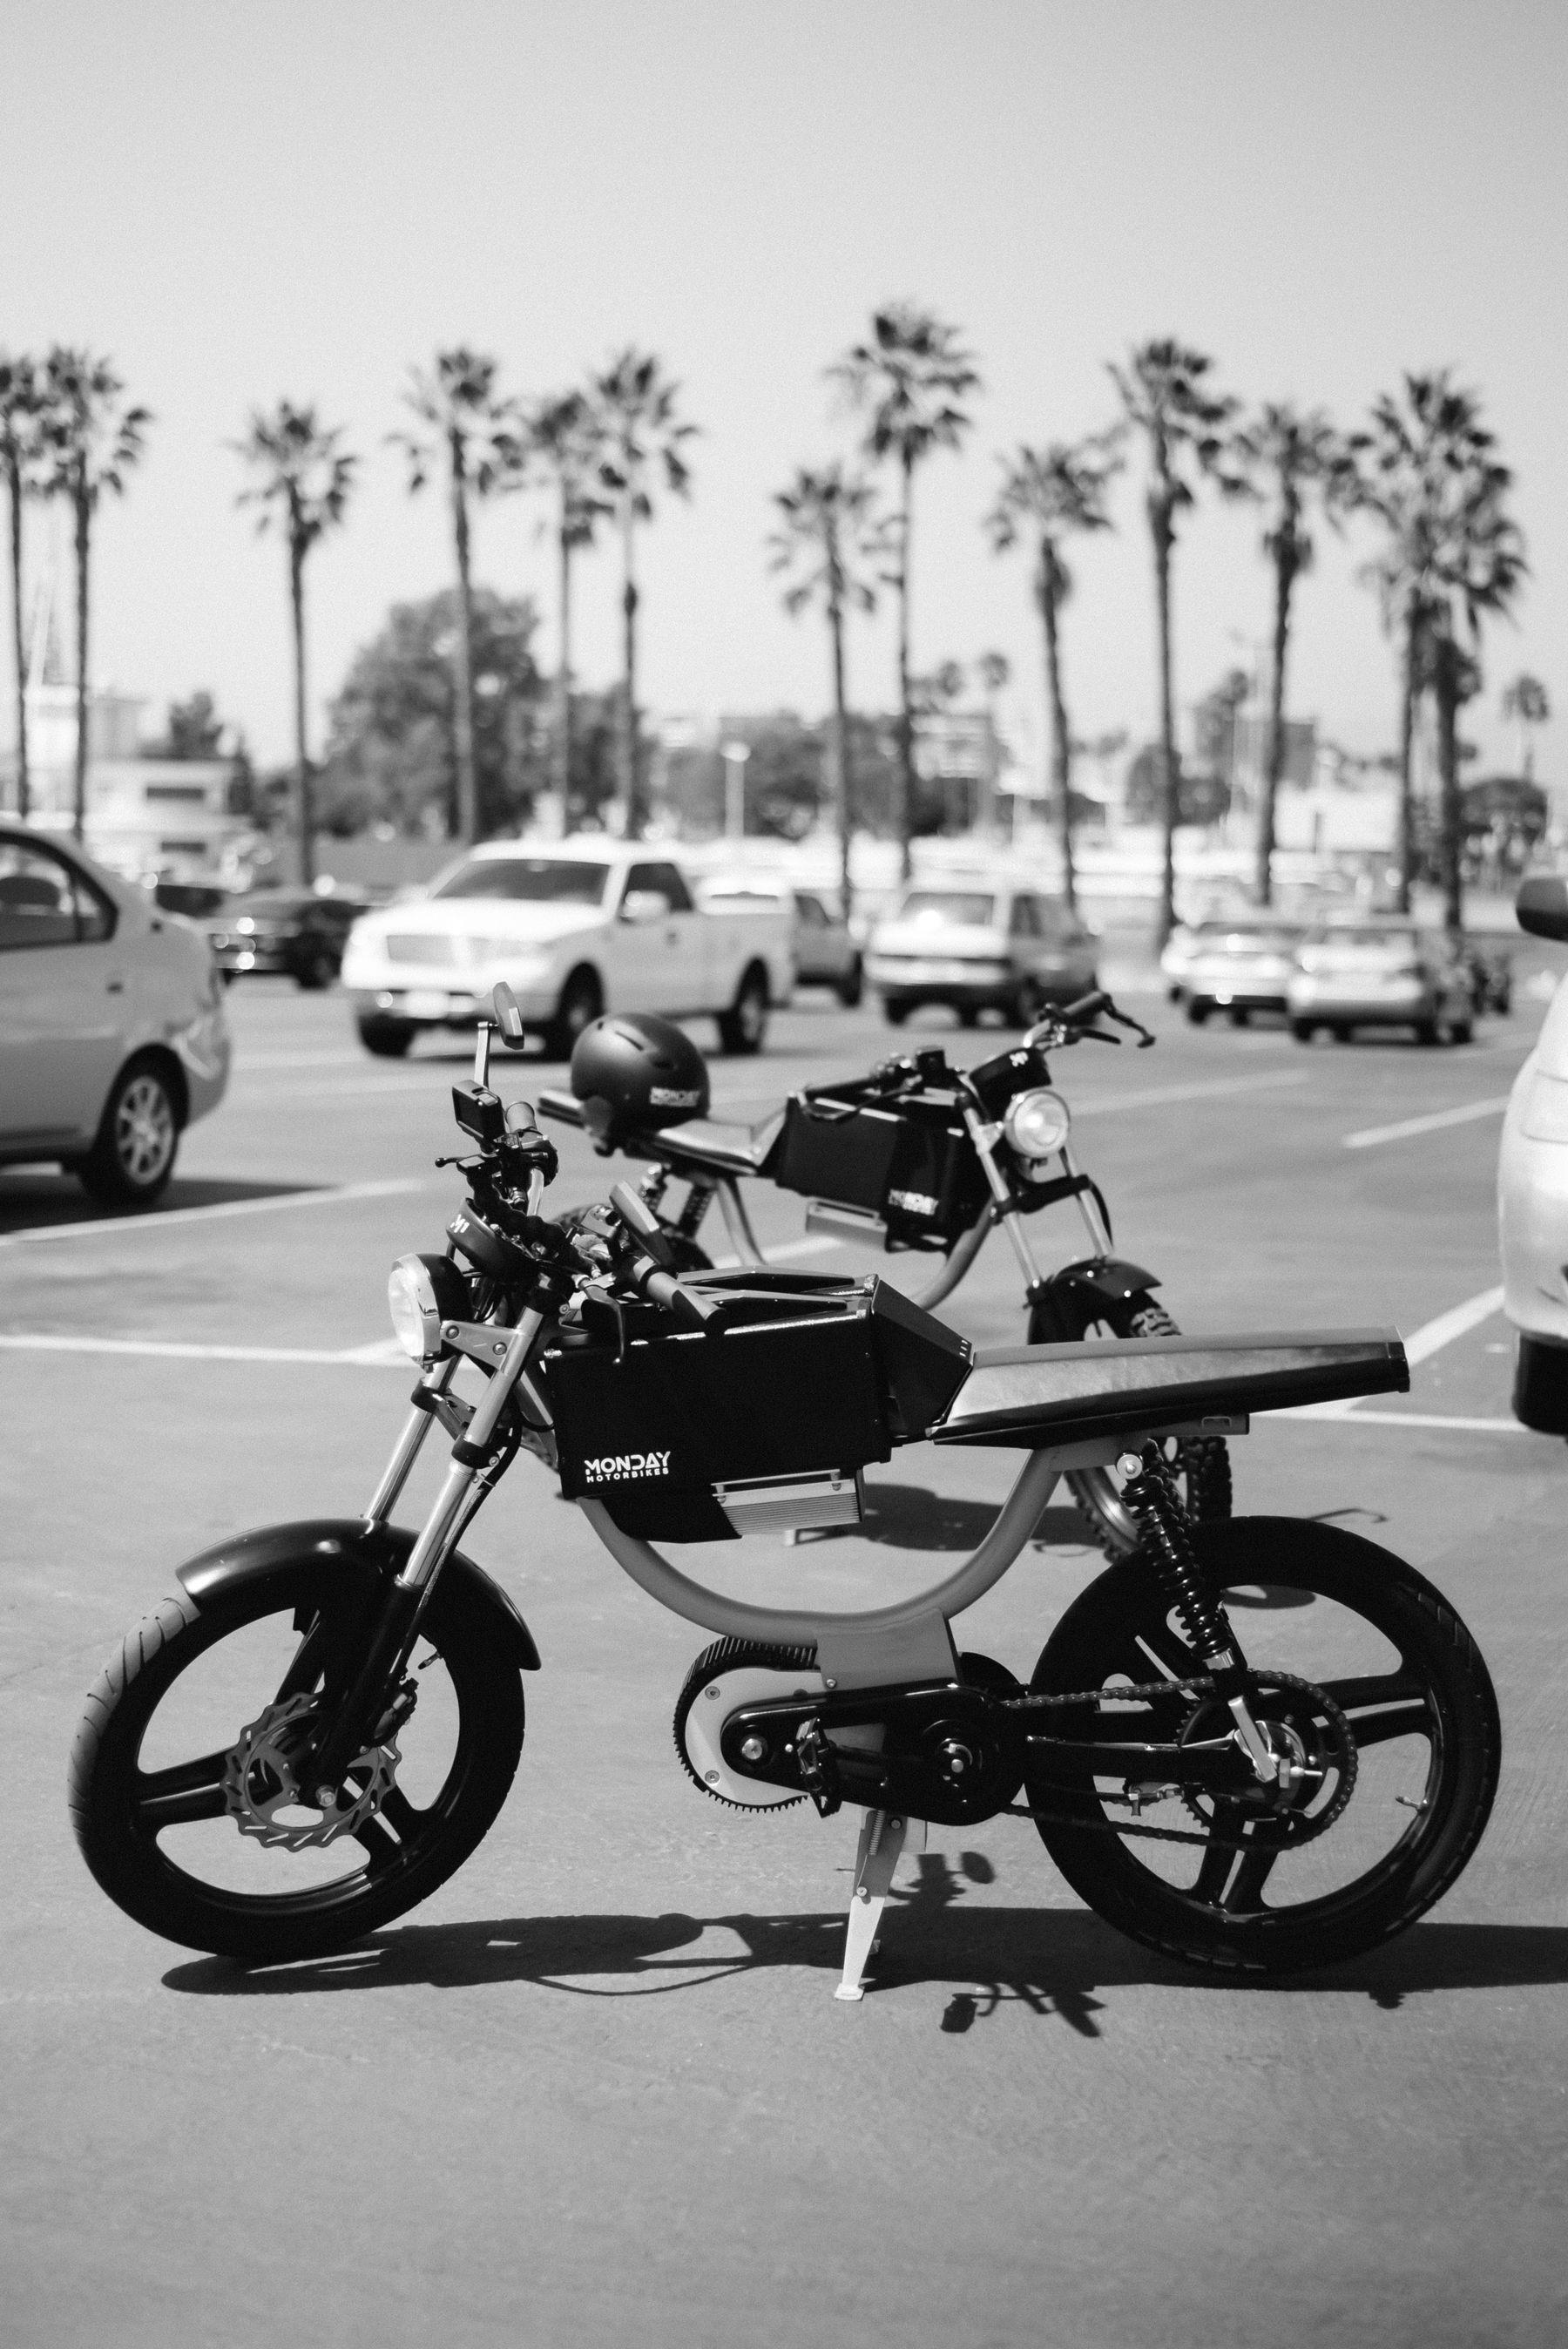 Monday Motorbikes Generation 6 Bike Foreground And Generation 7